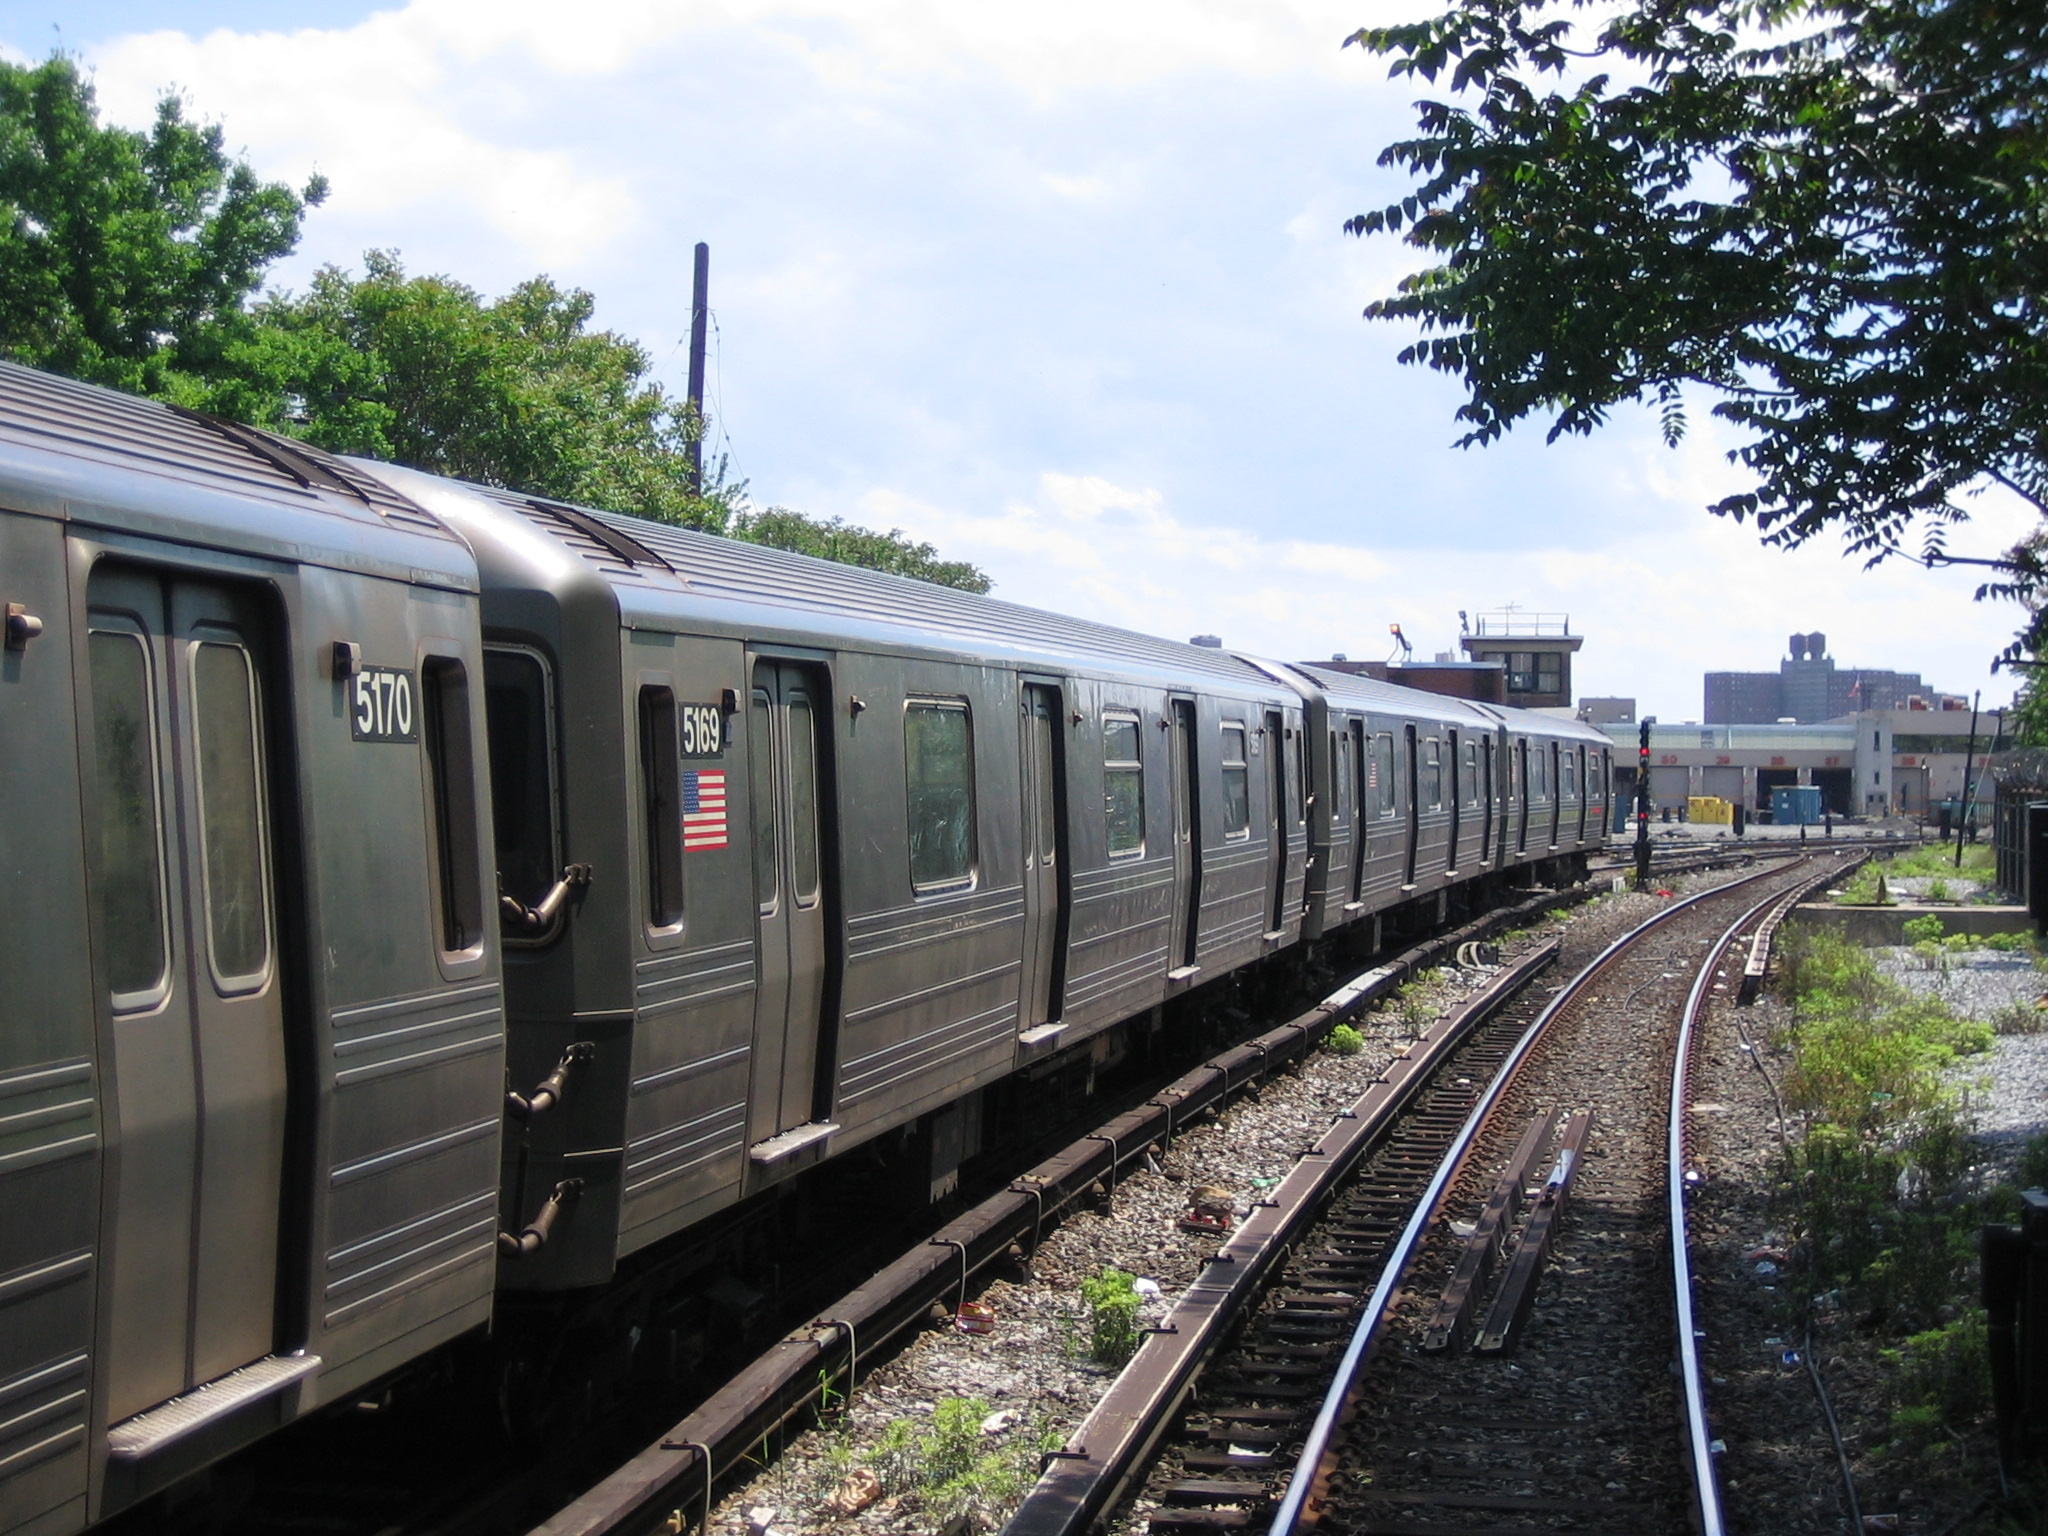 (1000k, 2048x1536)<br><b>Country:</b> United States<br><b>City:</b> New York<br><b>System:</b> New York City Transit<br><b>Line:</b> BMT Sea Beach Line<br><b>Location:</b> 86th Street <br><b>Route:</b> N<br><b>Car:</b> R-68A (Kawasaki, 1988-1989)  5169 <br><b>Photo by:</b> Michael Hodurski<br><b>Date:</b> 5/20/2006<br><b>Viewed (this week/total):</b> 1 / 2327